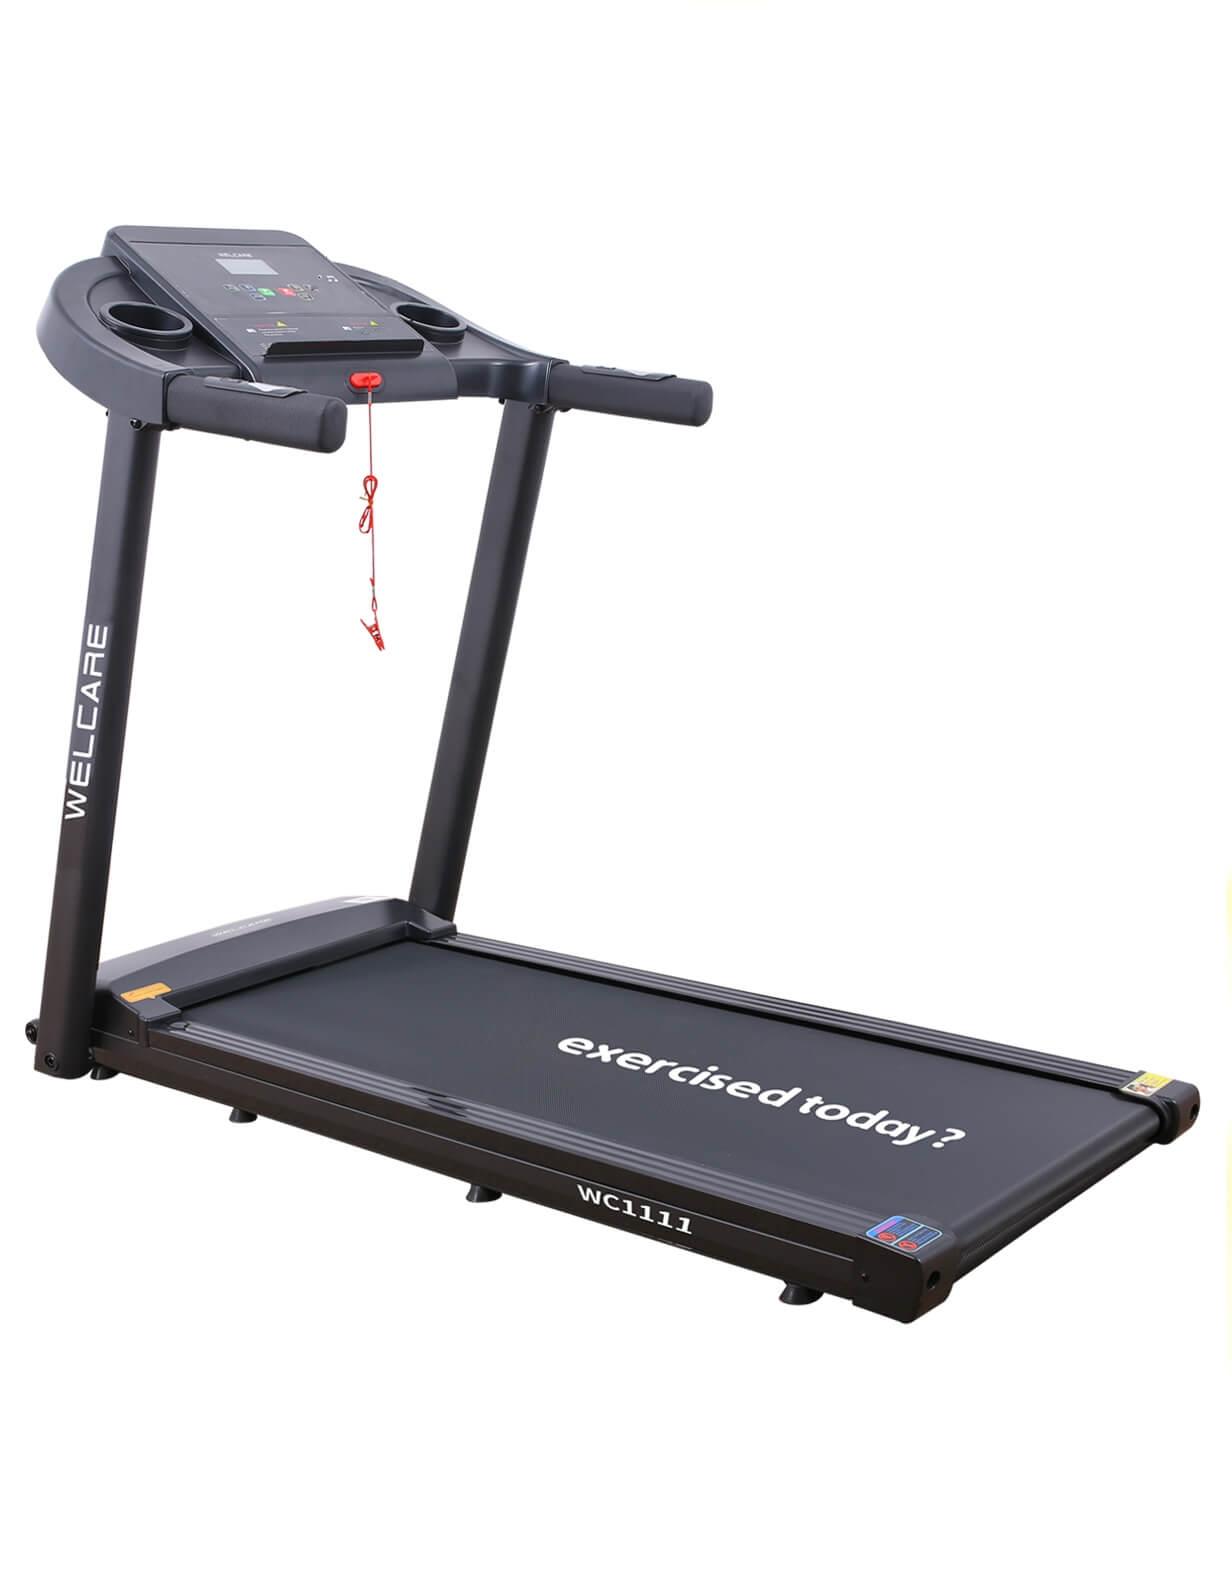 WC1111 Motorized Treadmill DC